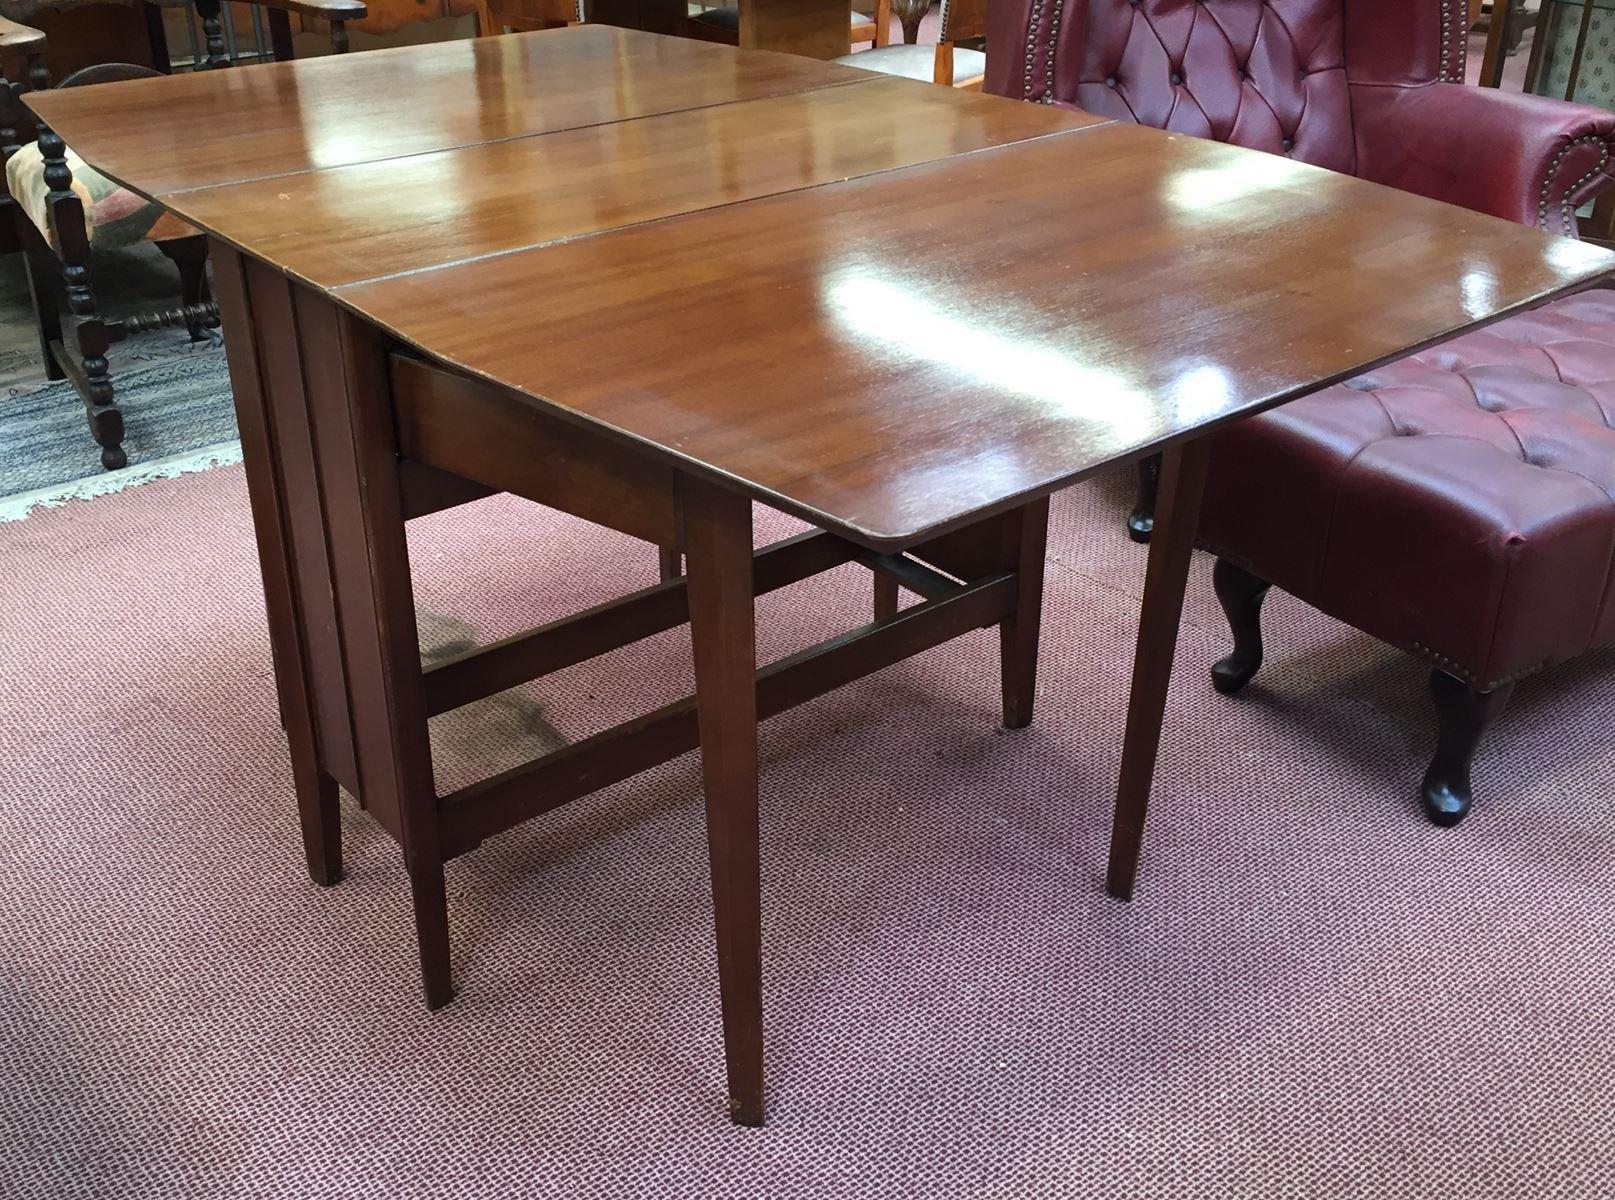 Walnut Gateleg Table 1970s for sale at Pamono